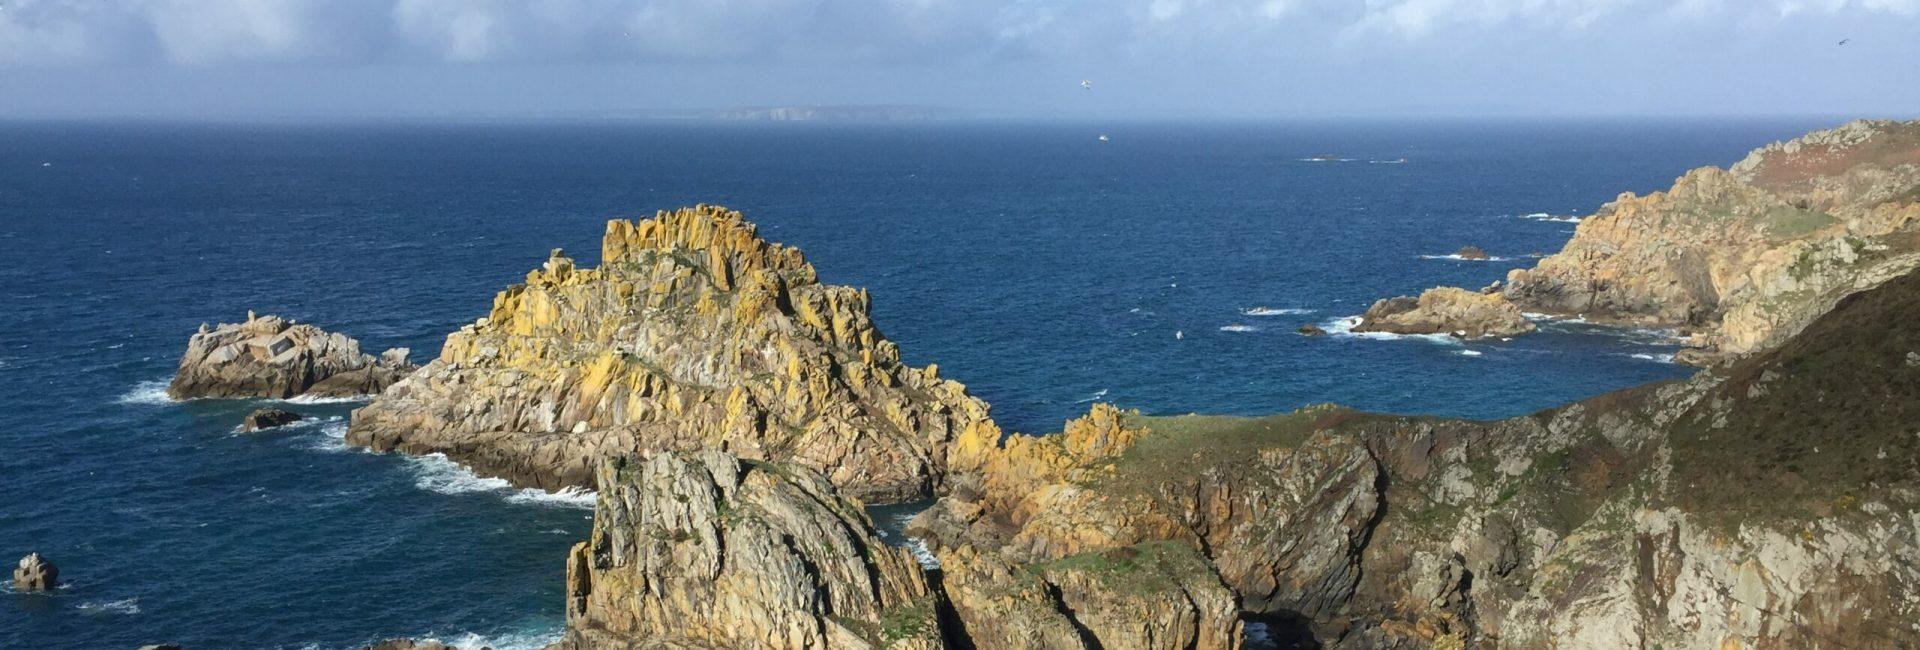 Küste Meer Landschaft